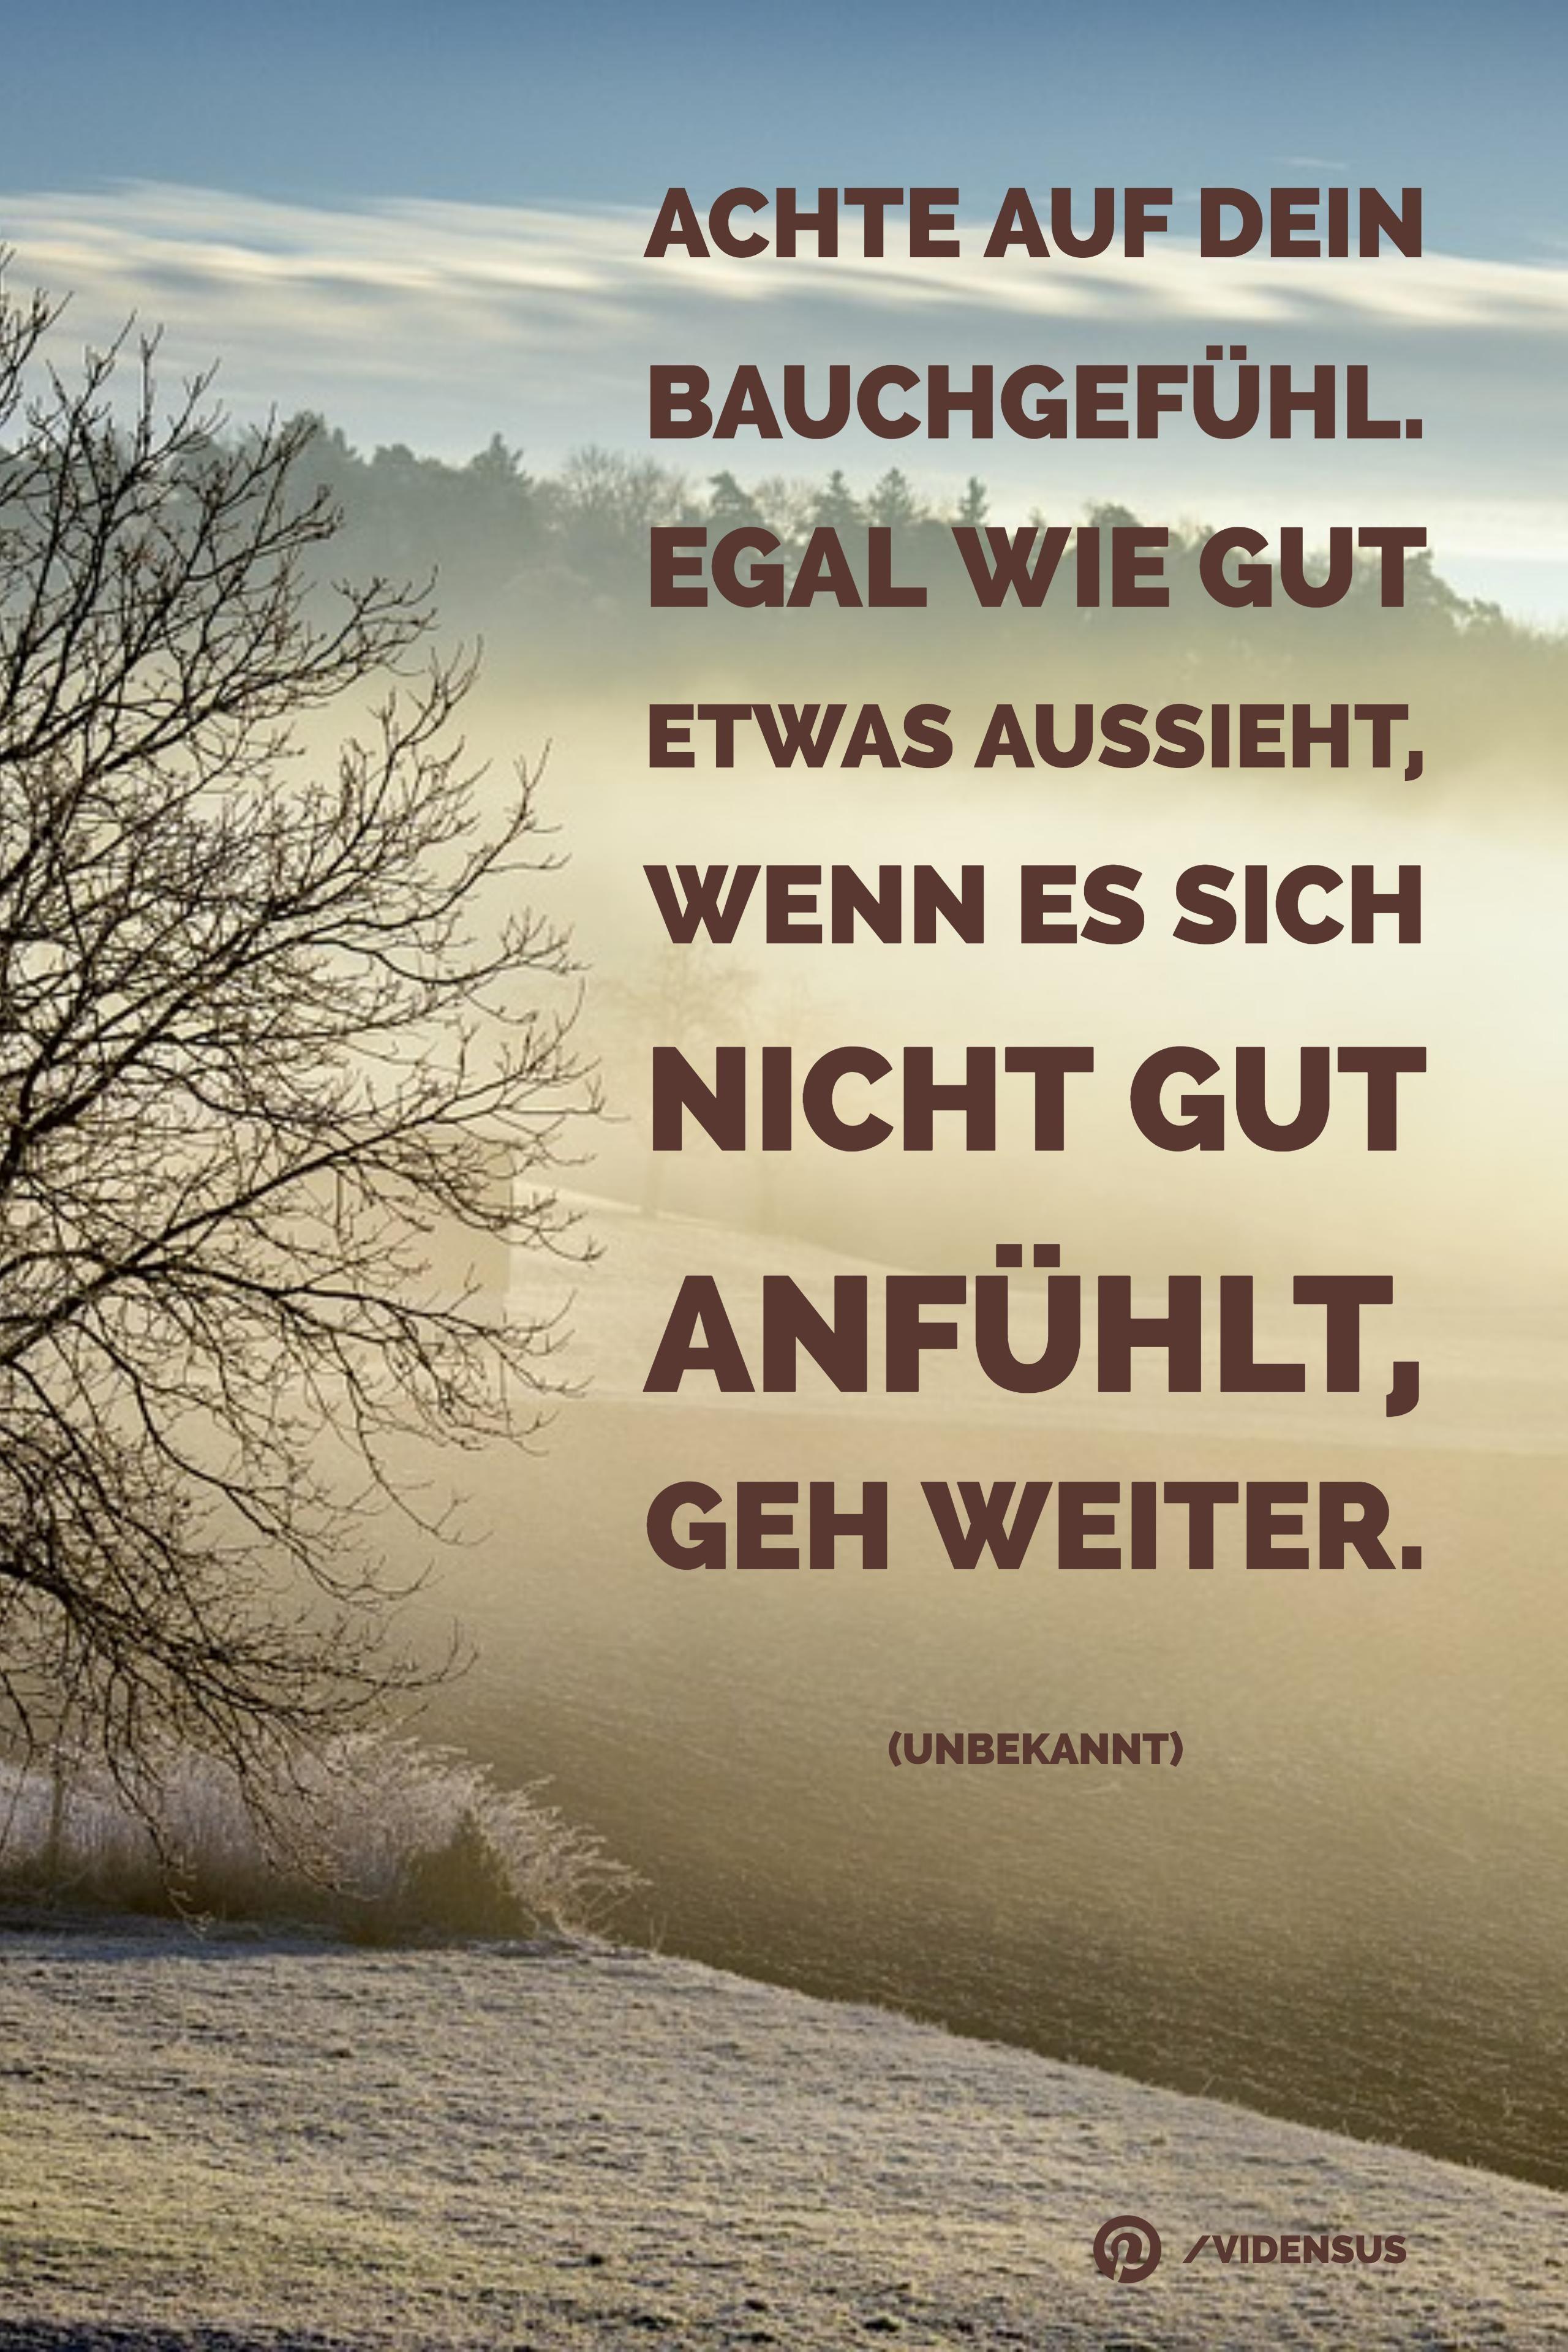 things, speaks) Single Männer Völklingen zum Flirten und Verlieben All above told the